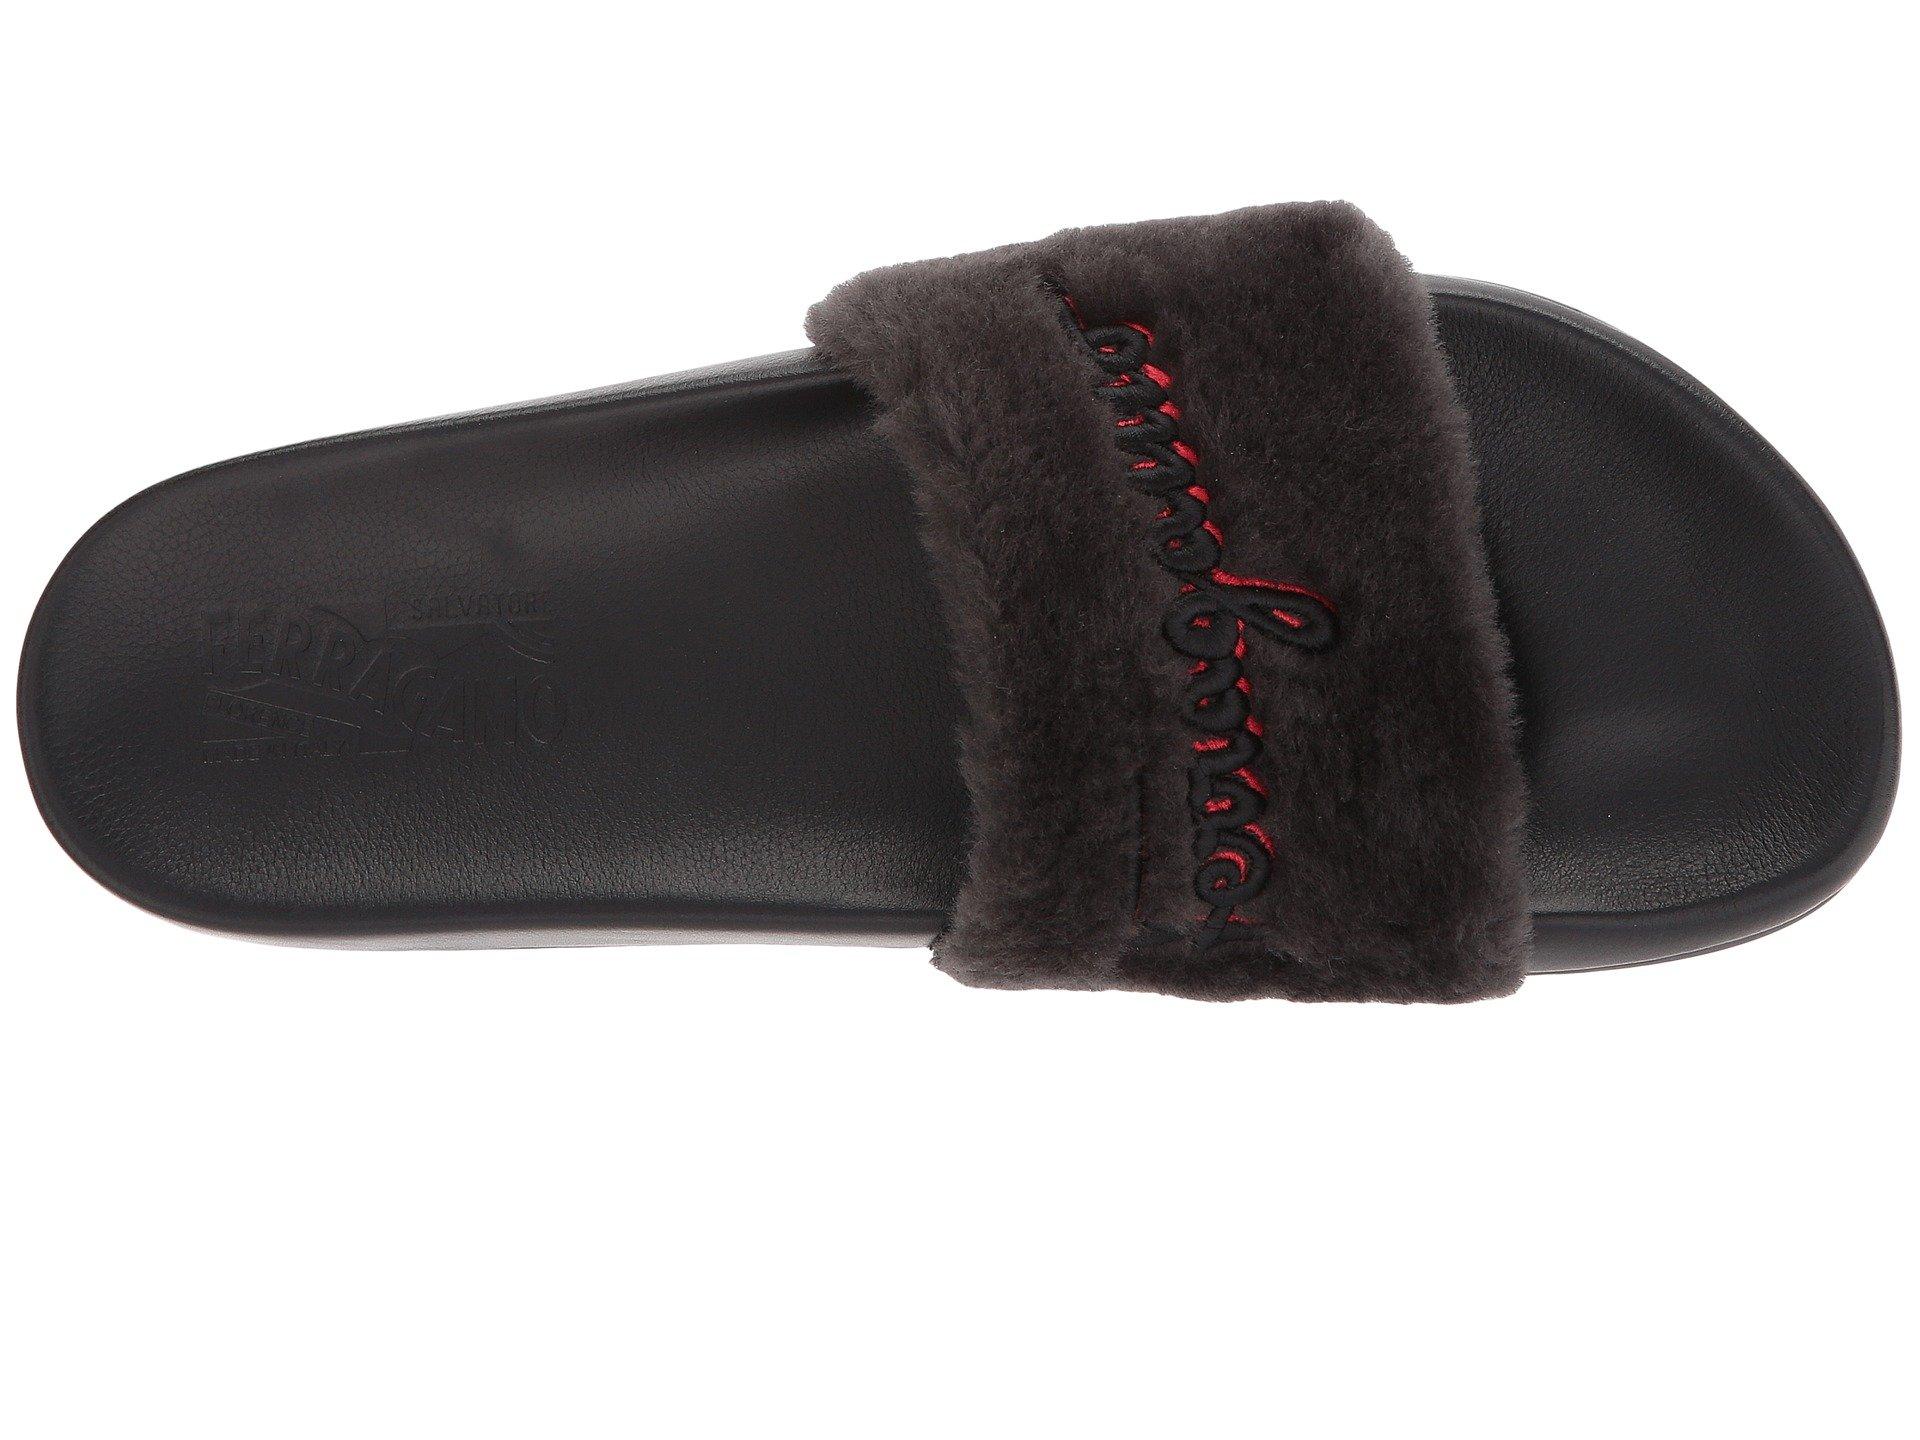 fdfff94b28d Salvatore ferragamo don sandal jpg 1920x1440 Ferragamo womens pool sandals